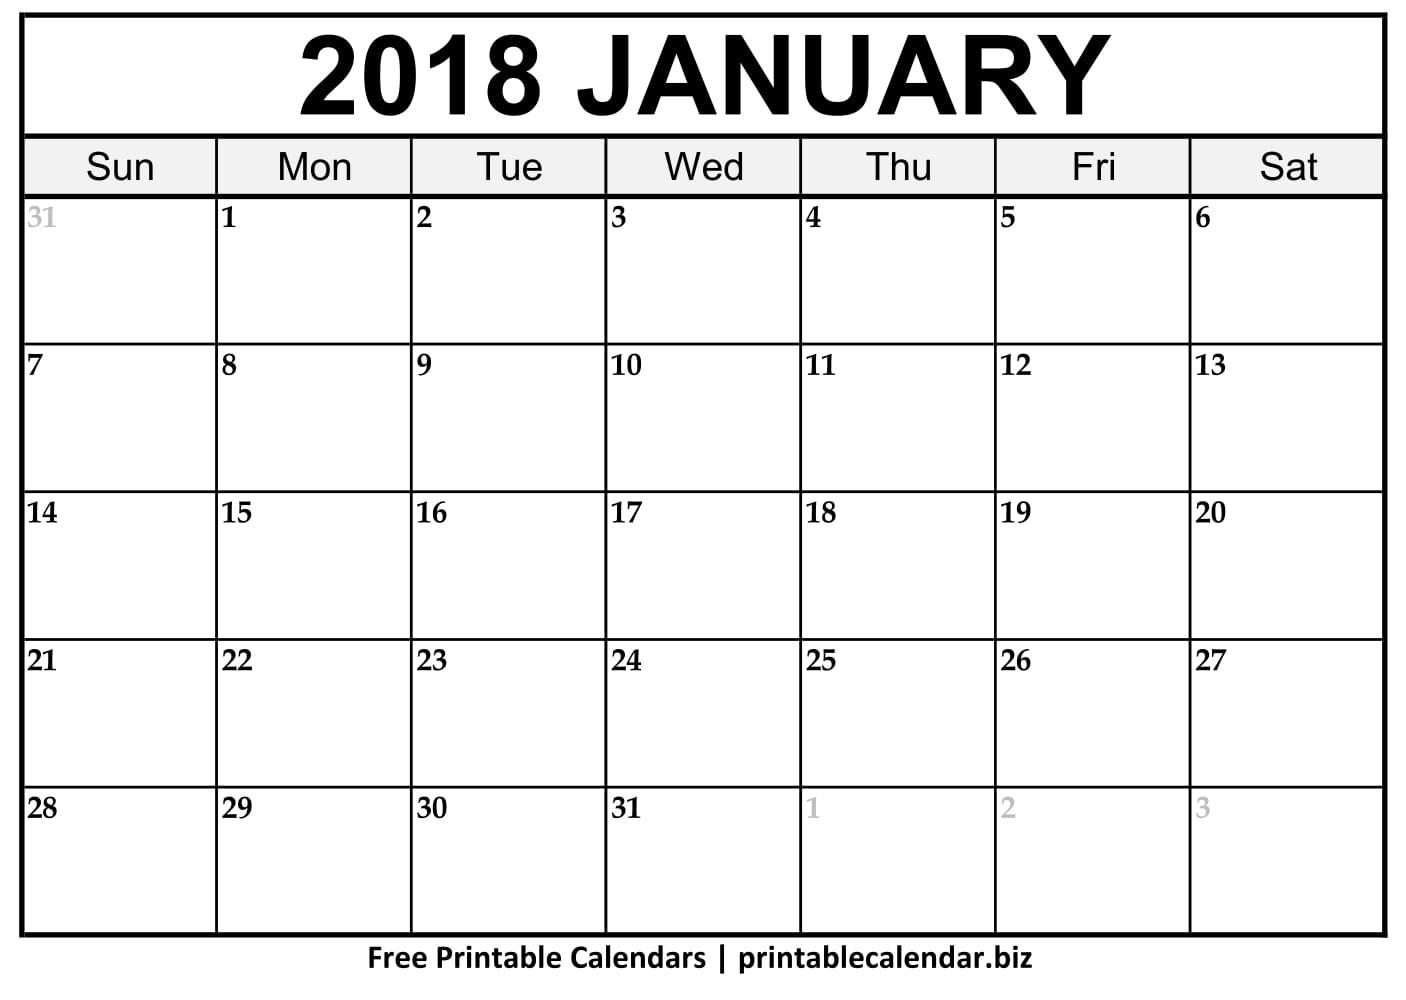 2019 Printable Calendar Templates - Printablecalendar.biz inside Free Blank Calendar Templates To Print